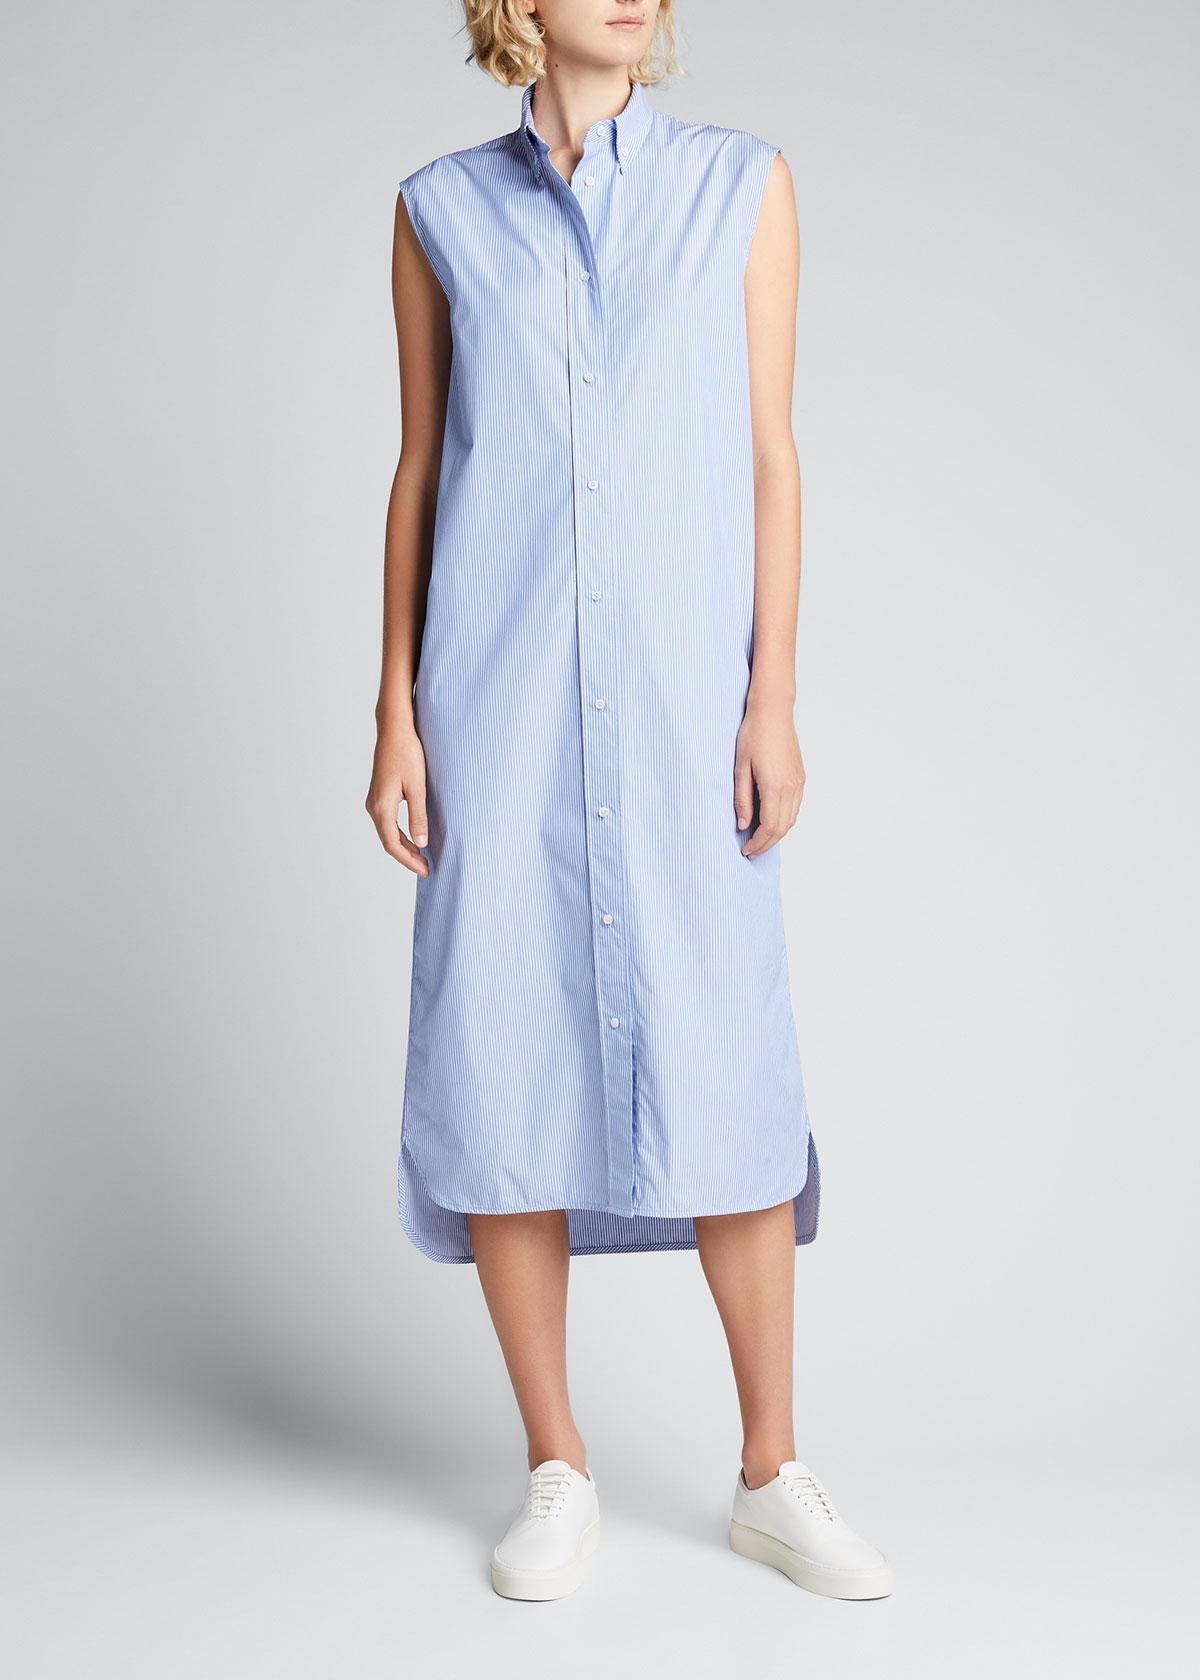 Loulou Studio UKARA LONG STRIPED COTTON DRESS